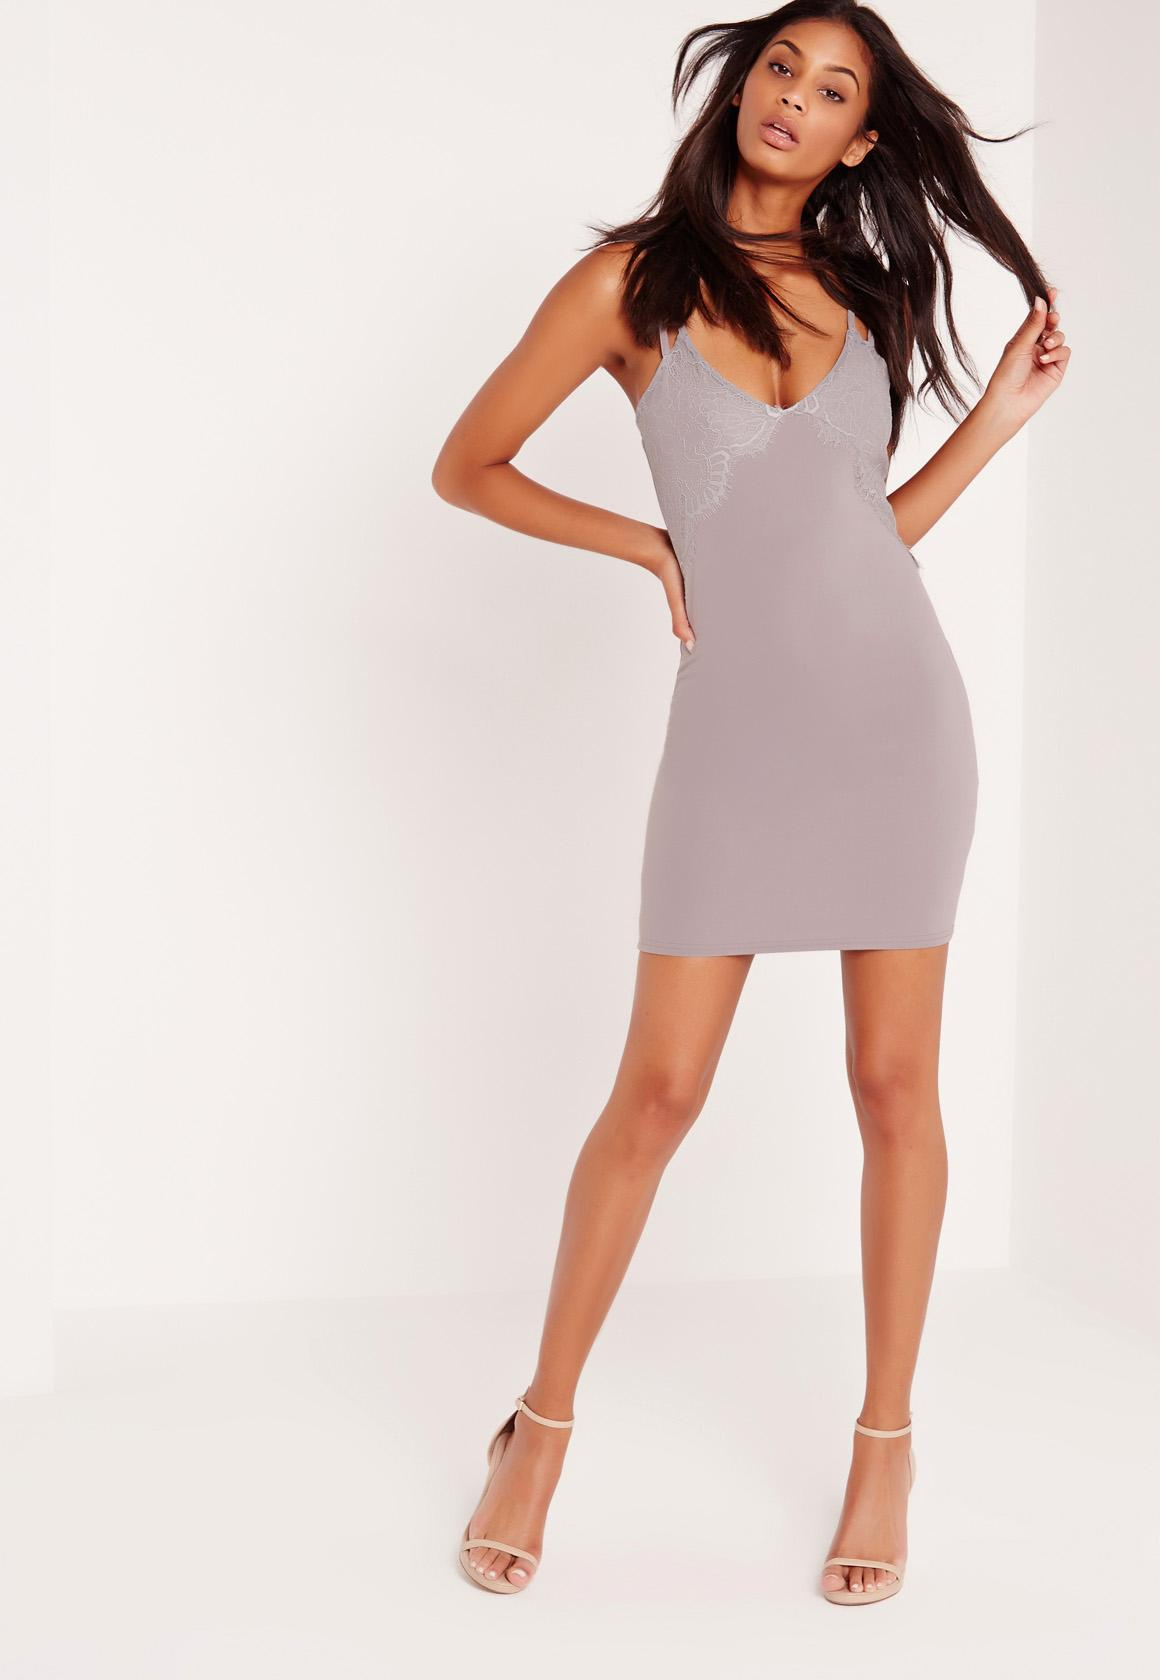 Double Strap Lace Insert Bodycon Dress Grey